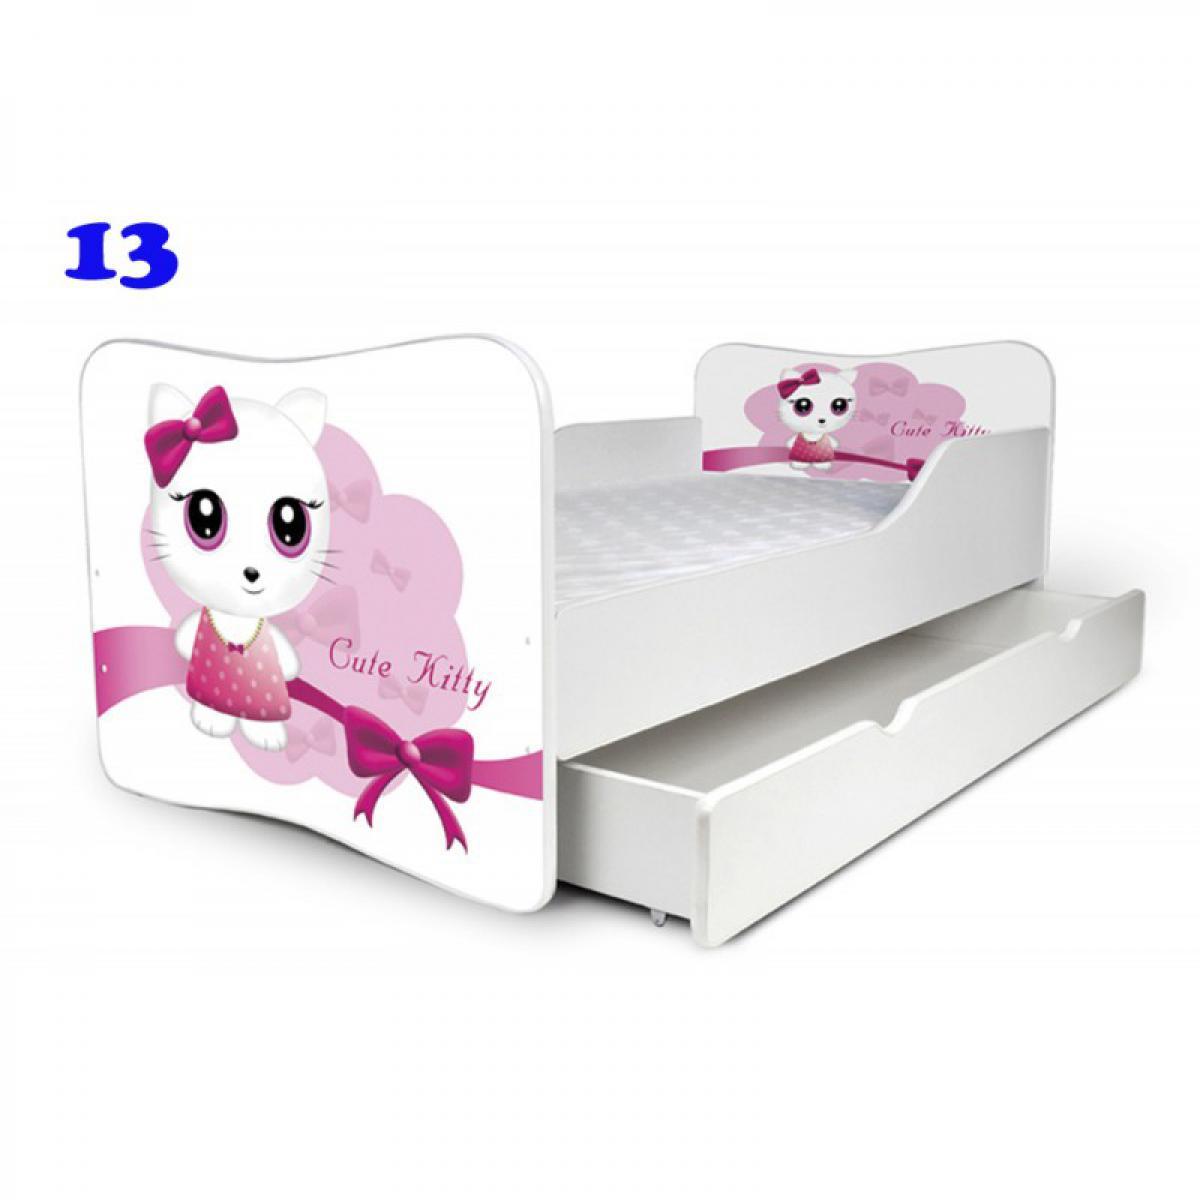 Bim Furniture Lit Enfant 160x80 cm avec Tiroir Cute Kitty Blanc avec sommier et matelas